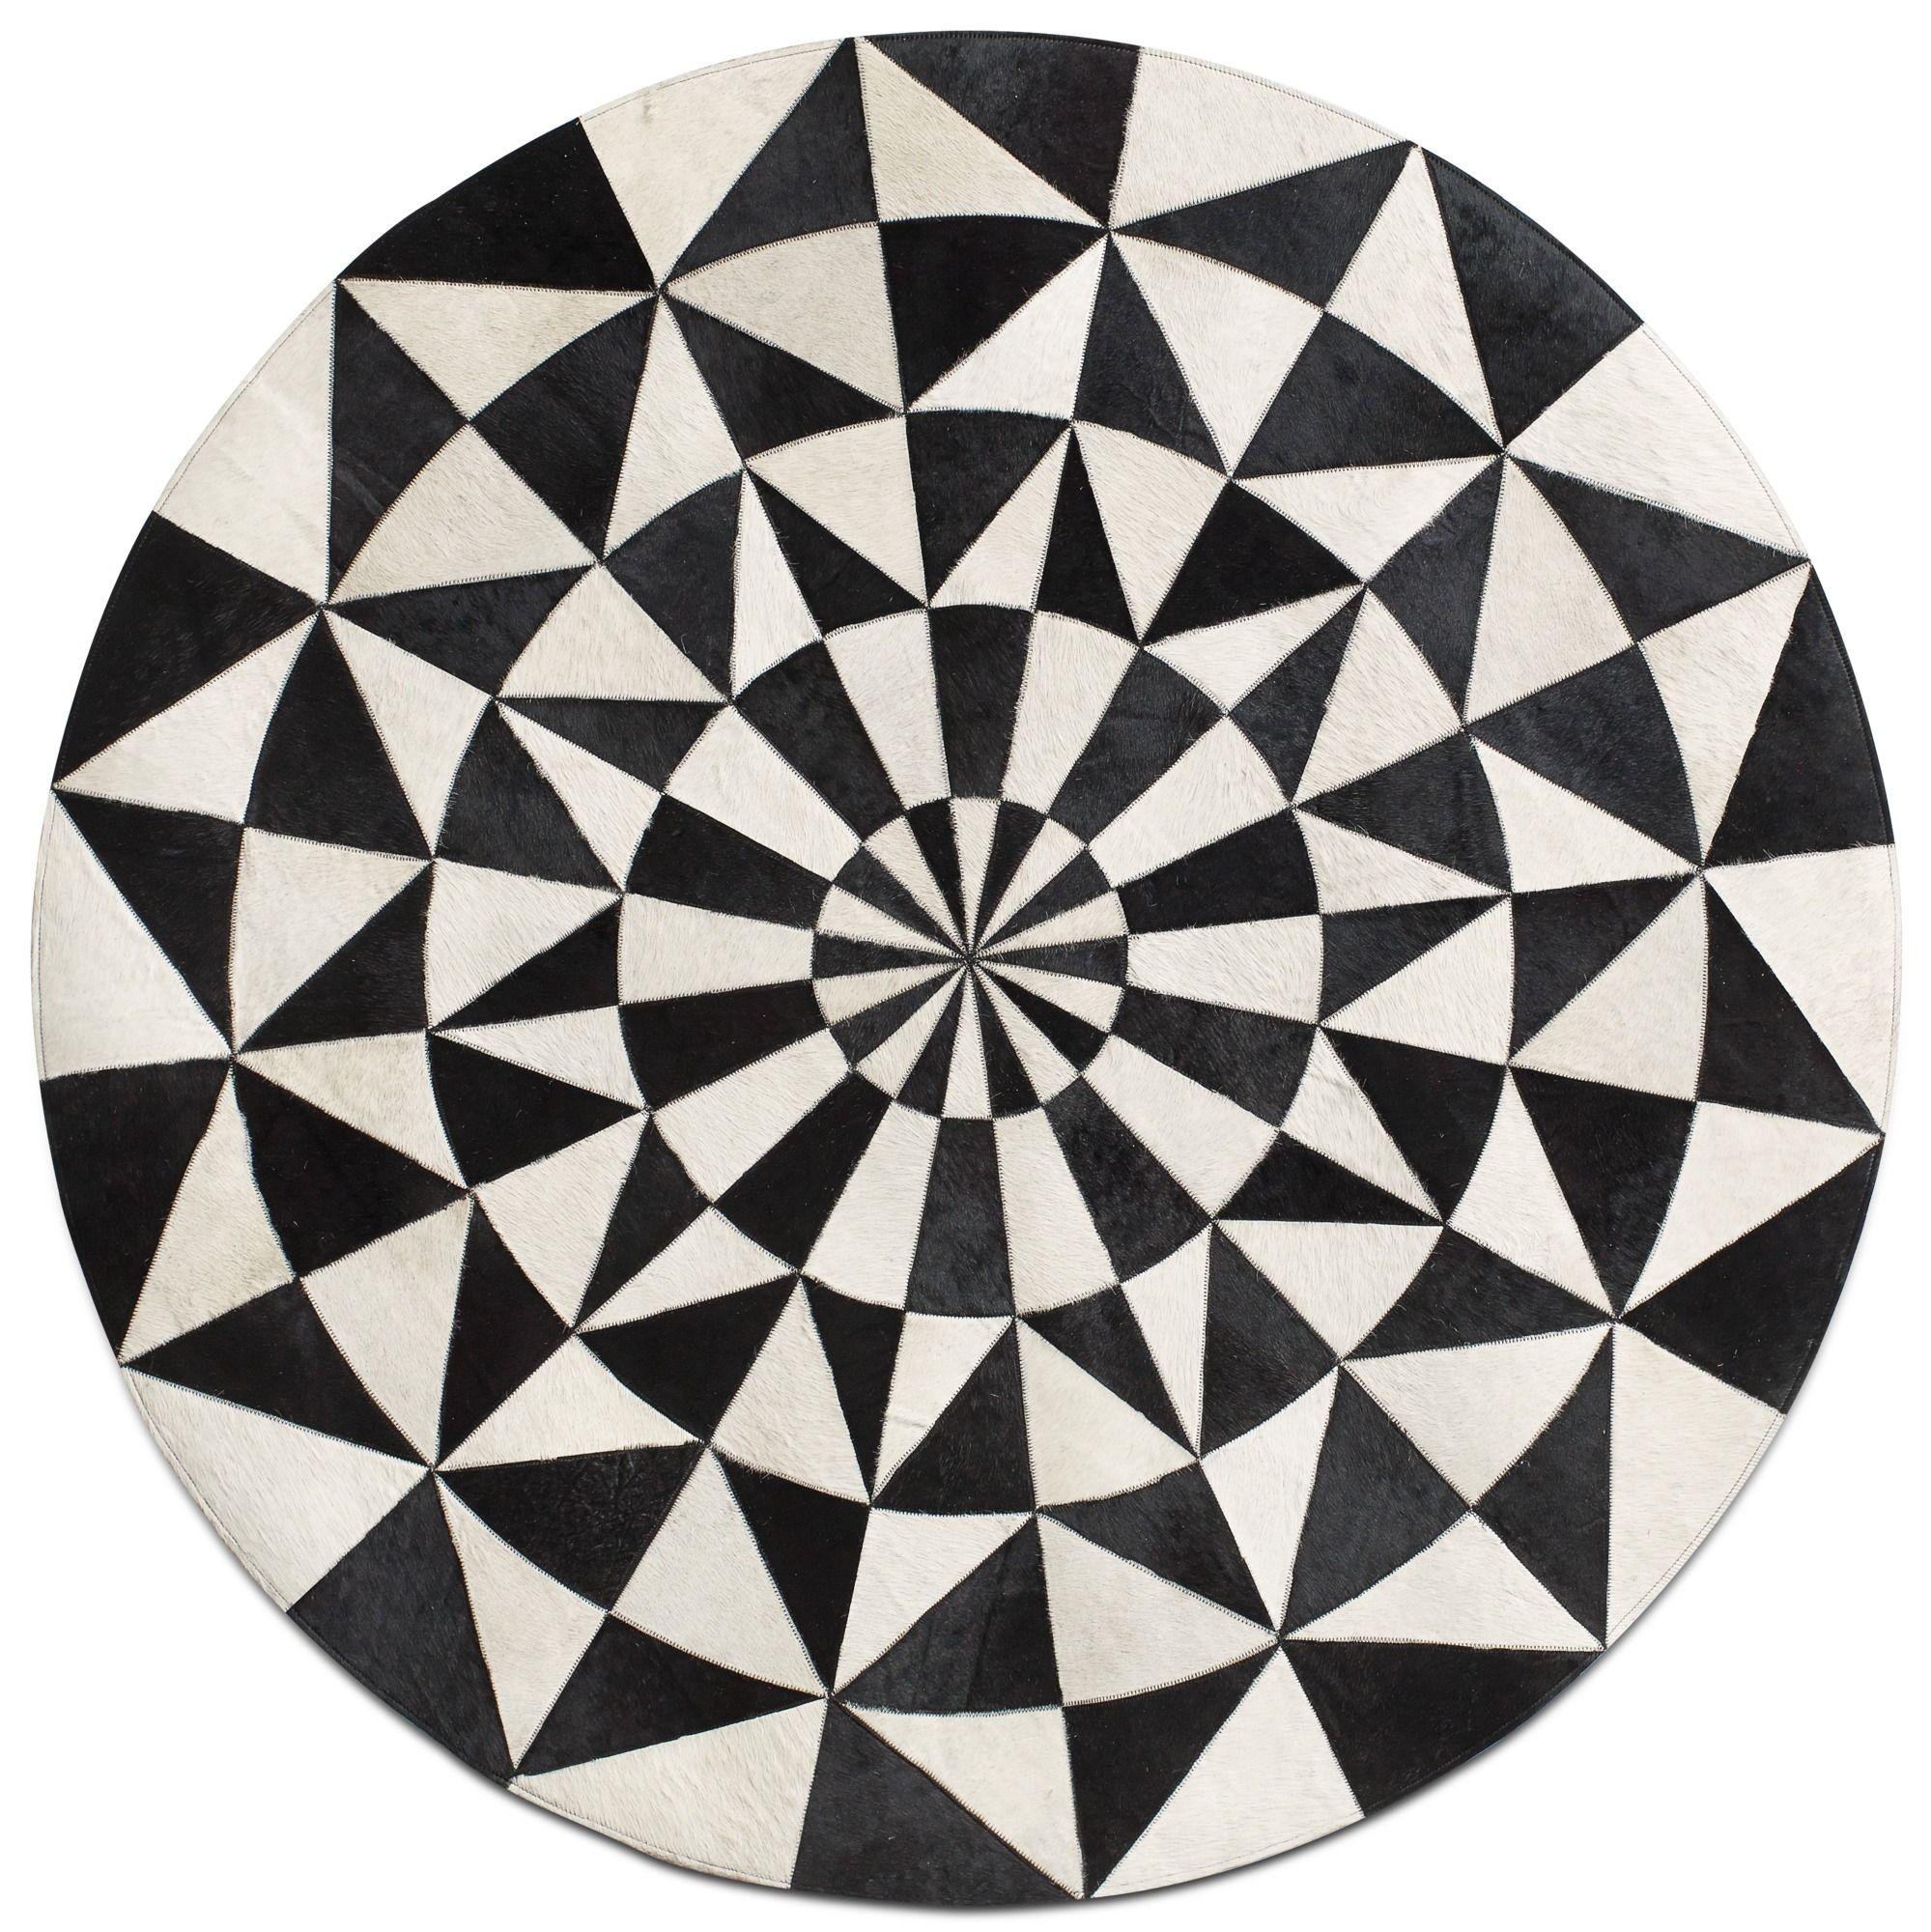 cm diameter leather contemporary round rugs  quality from  - contemporary round rugs  quality from boconcept